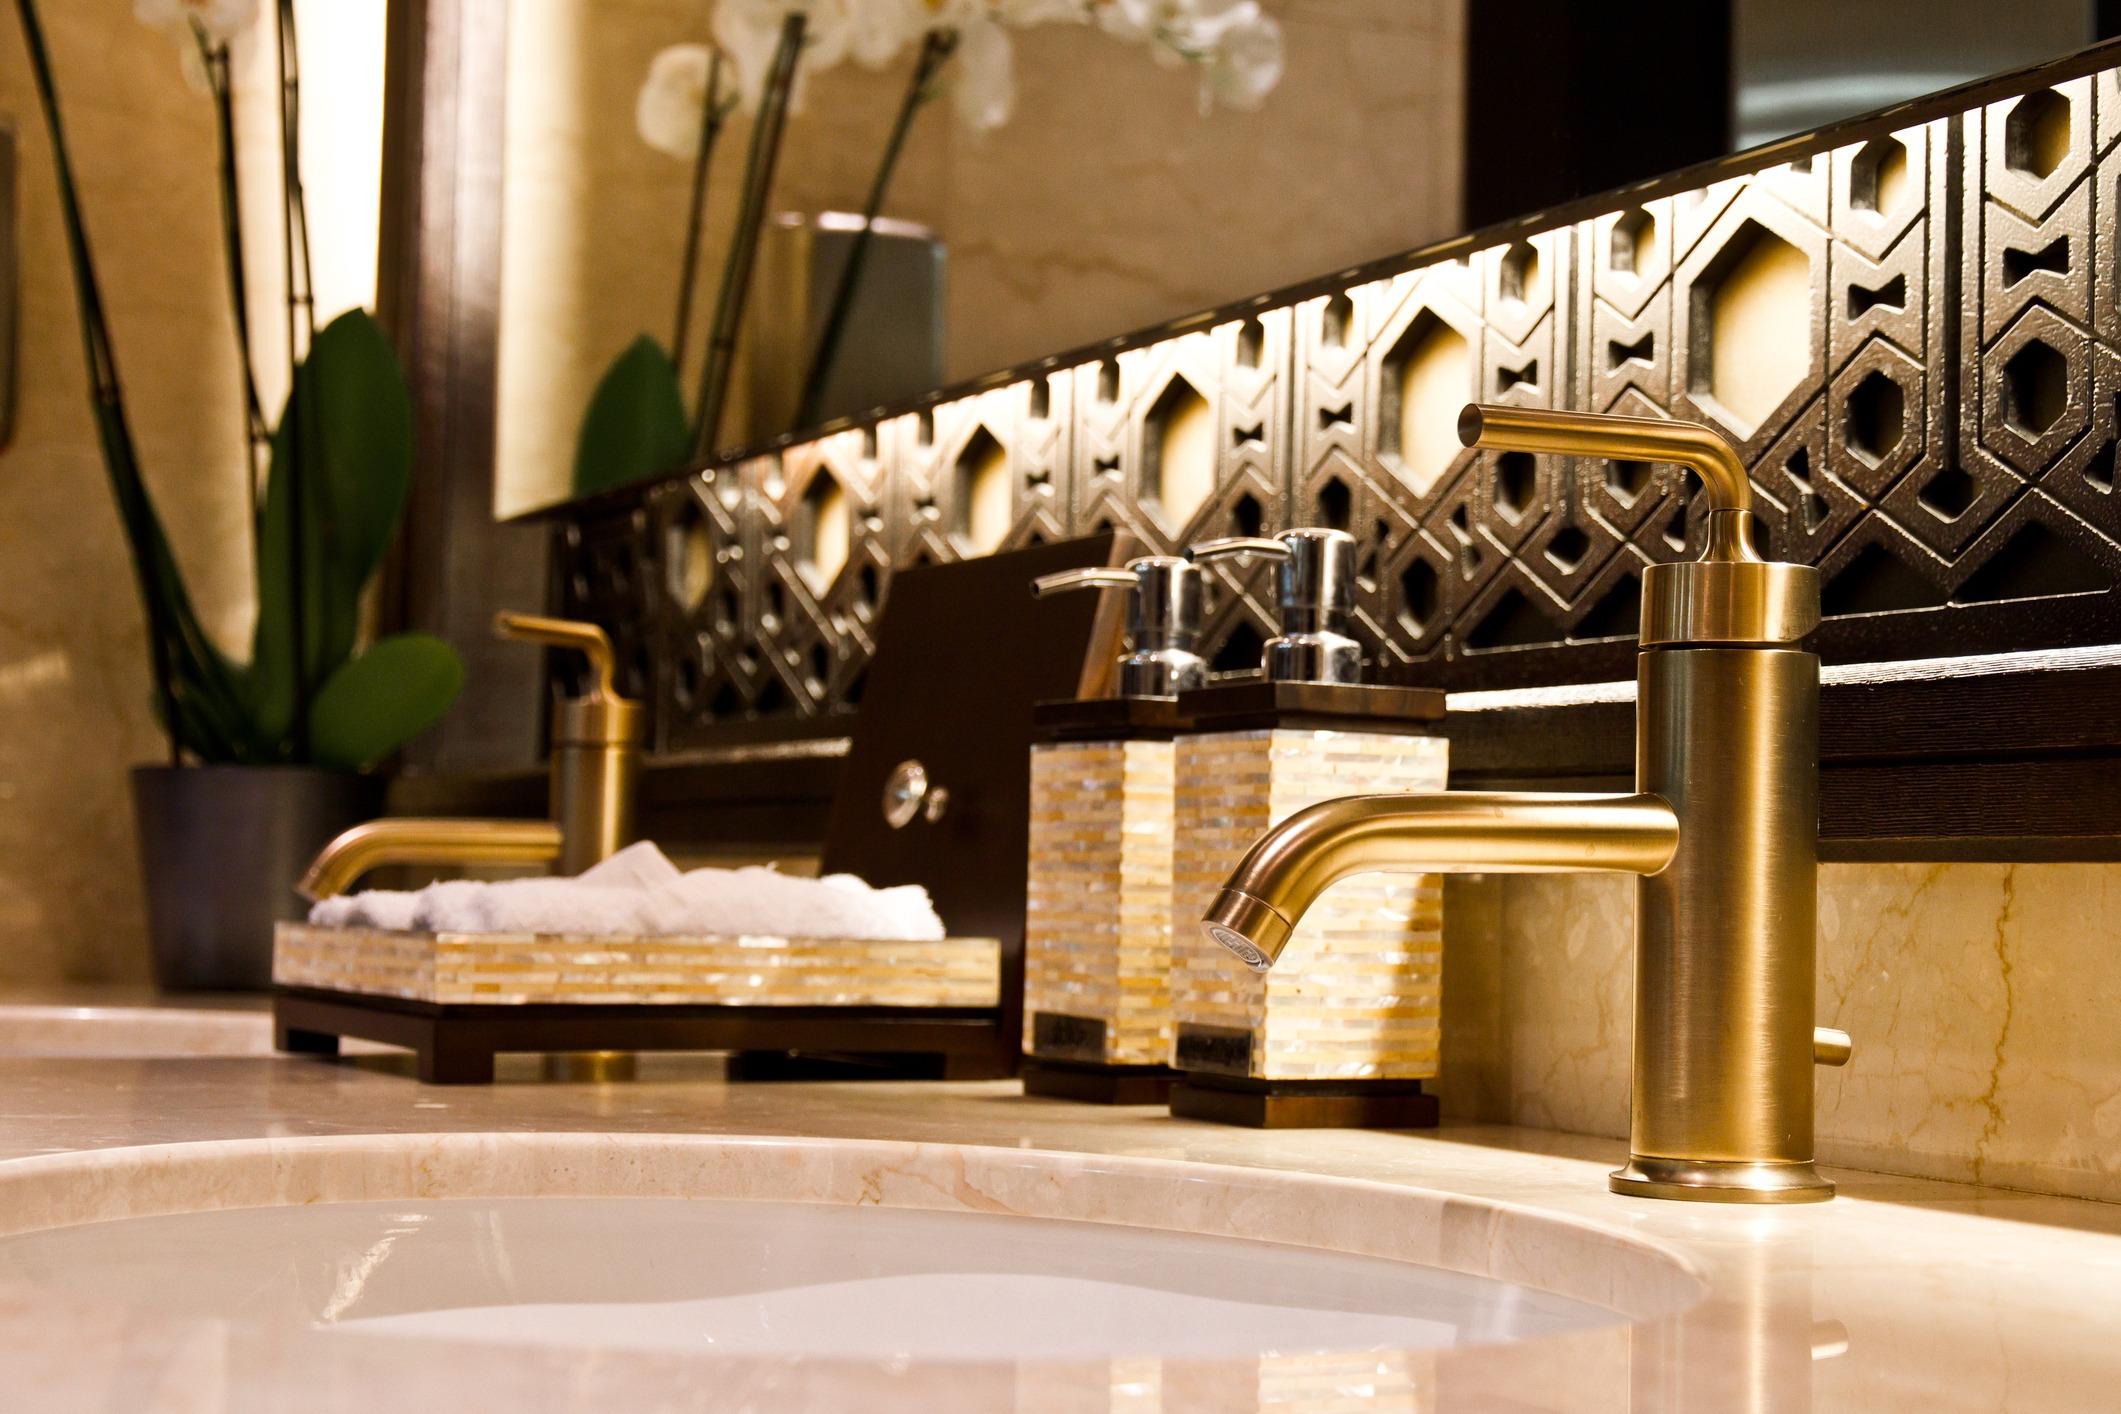 Elegant sinks with marble countertop